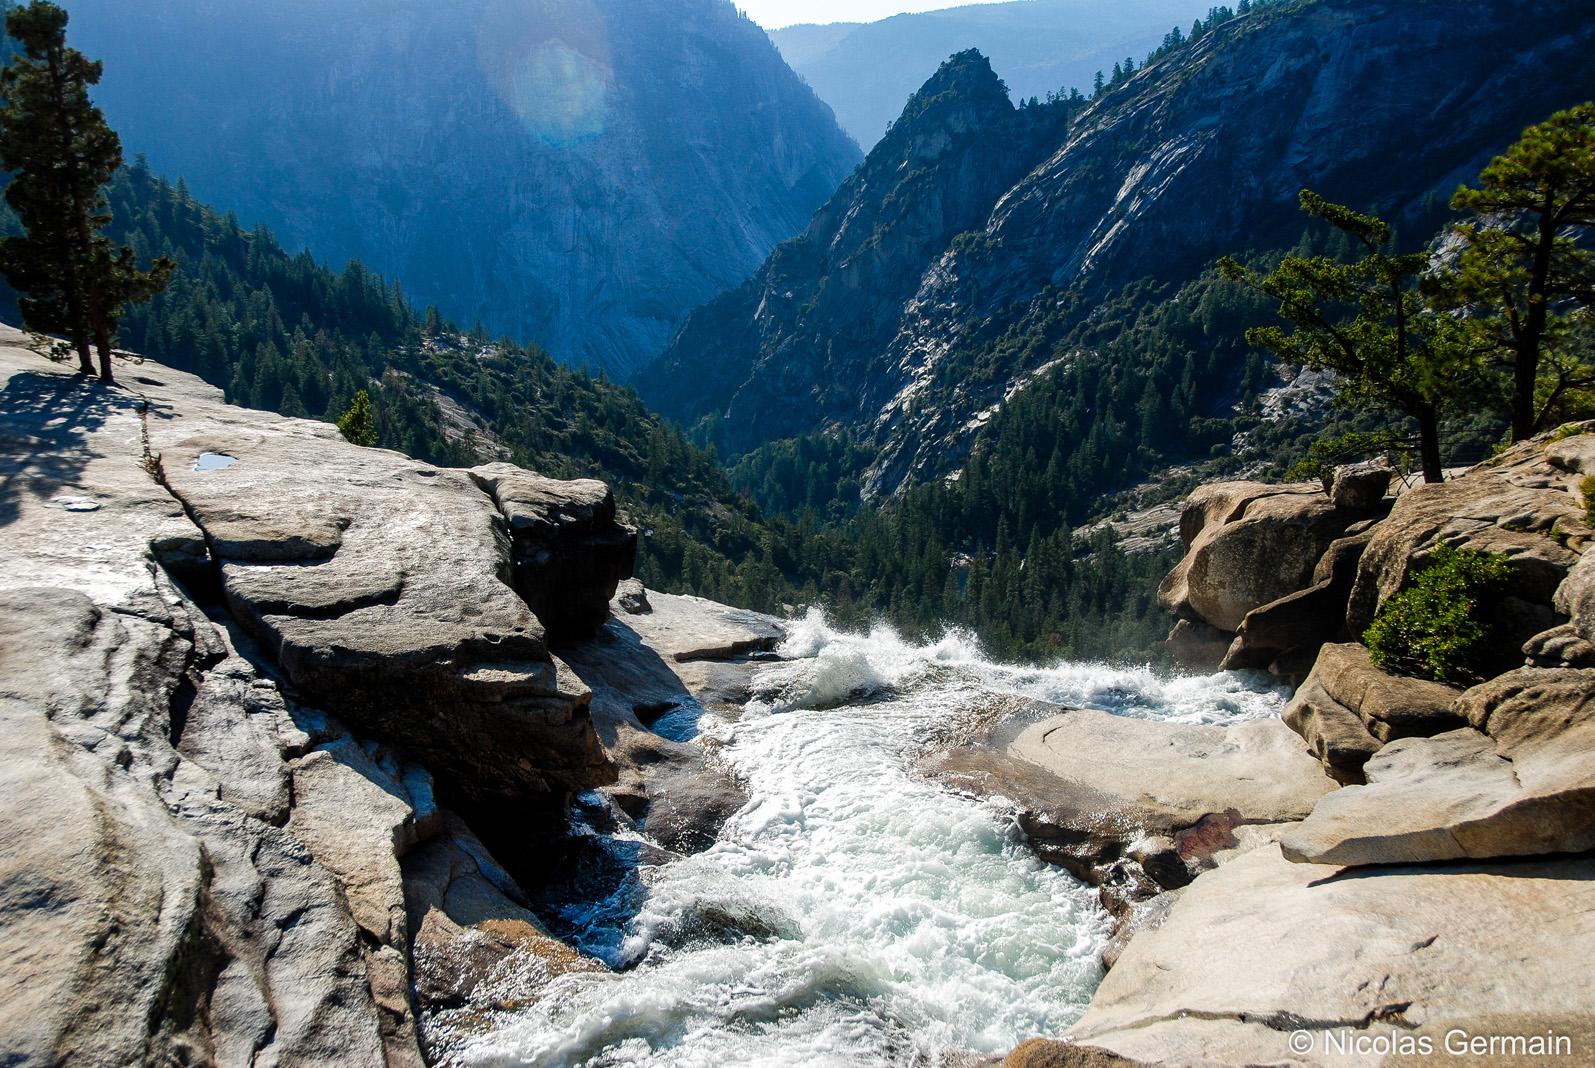 Sommet de la chute de Nevada Falls, Yosemite